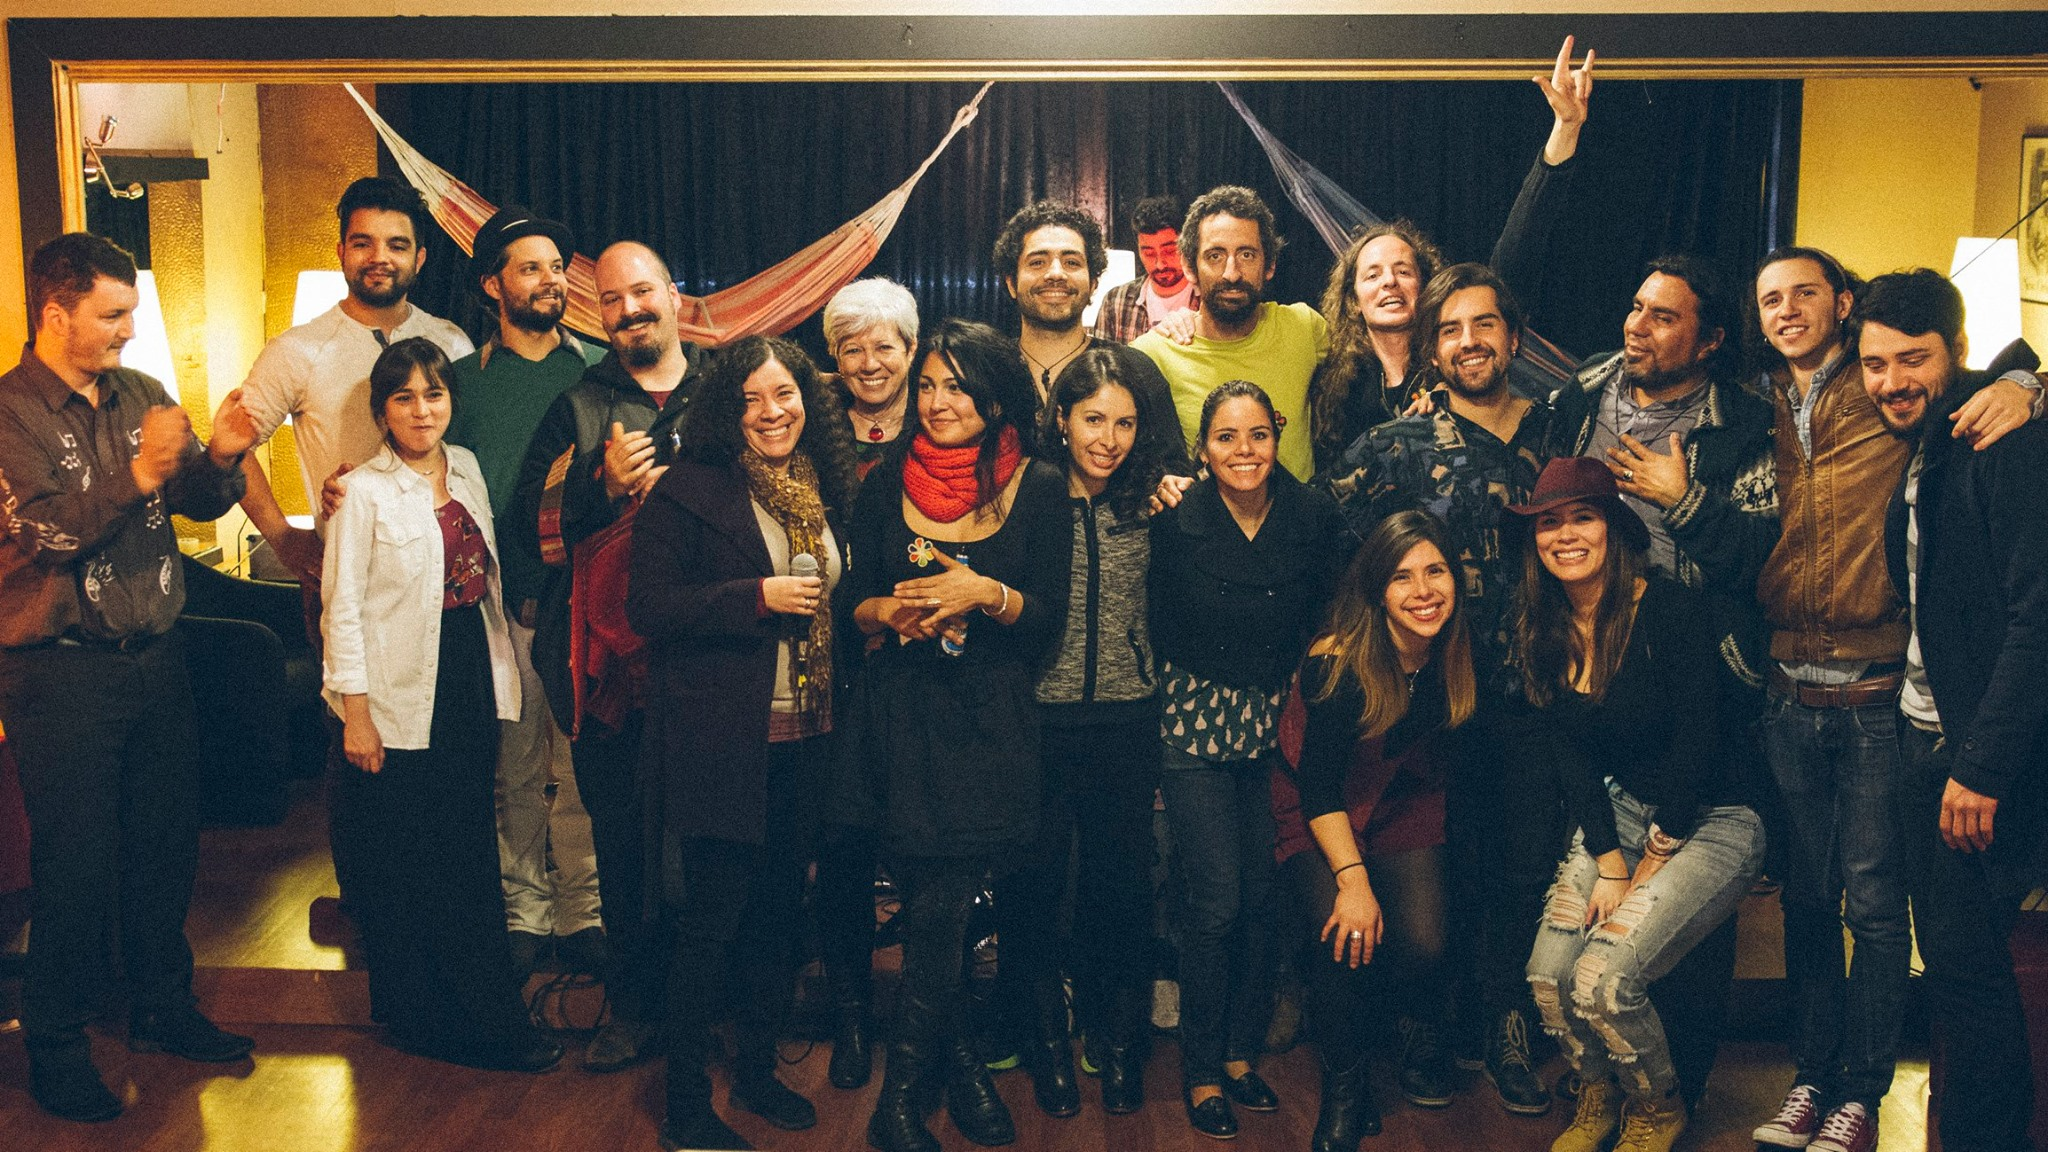 Casa Cultura – Encuentro 2 A three-fold musical collaboration. Photo by Gabriela Gonzalez 2015